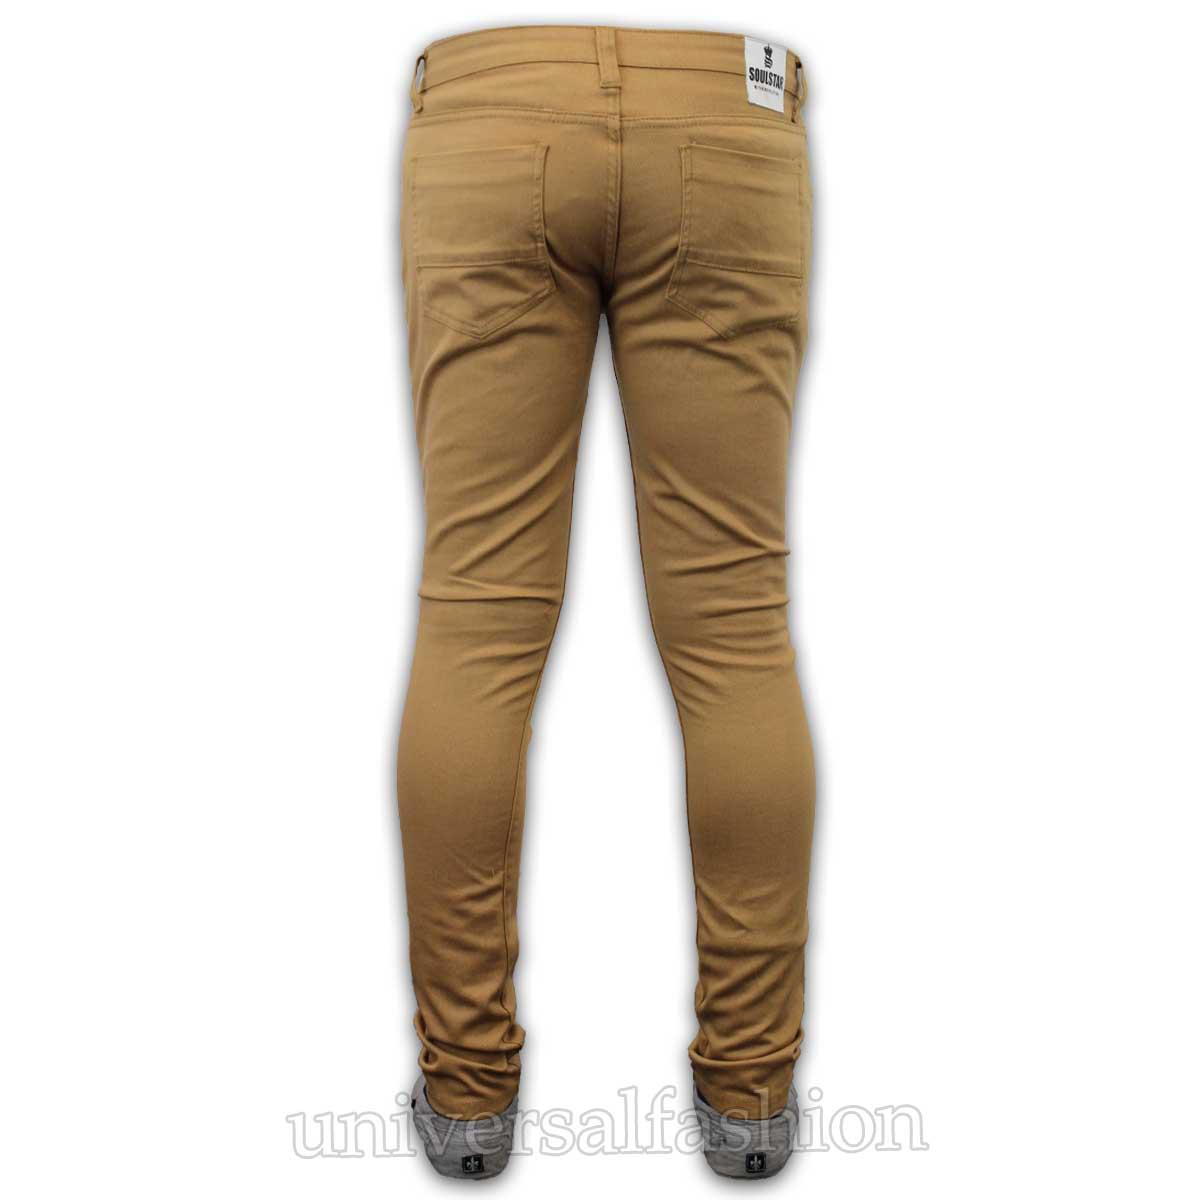 Mens Skinny Jeans Soul Star Slim Fit Stretch Denim Pants ...